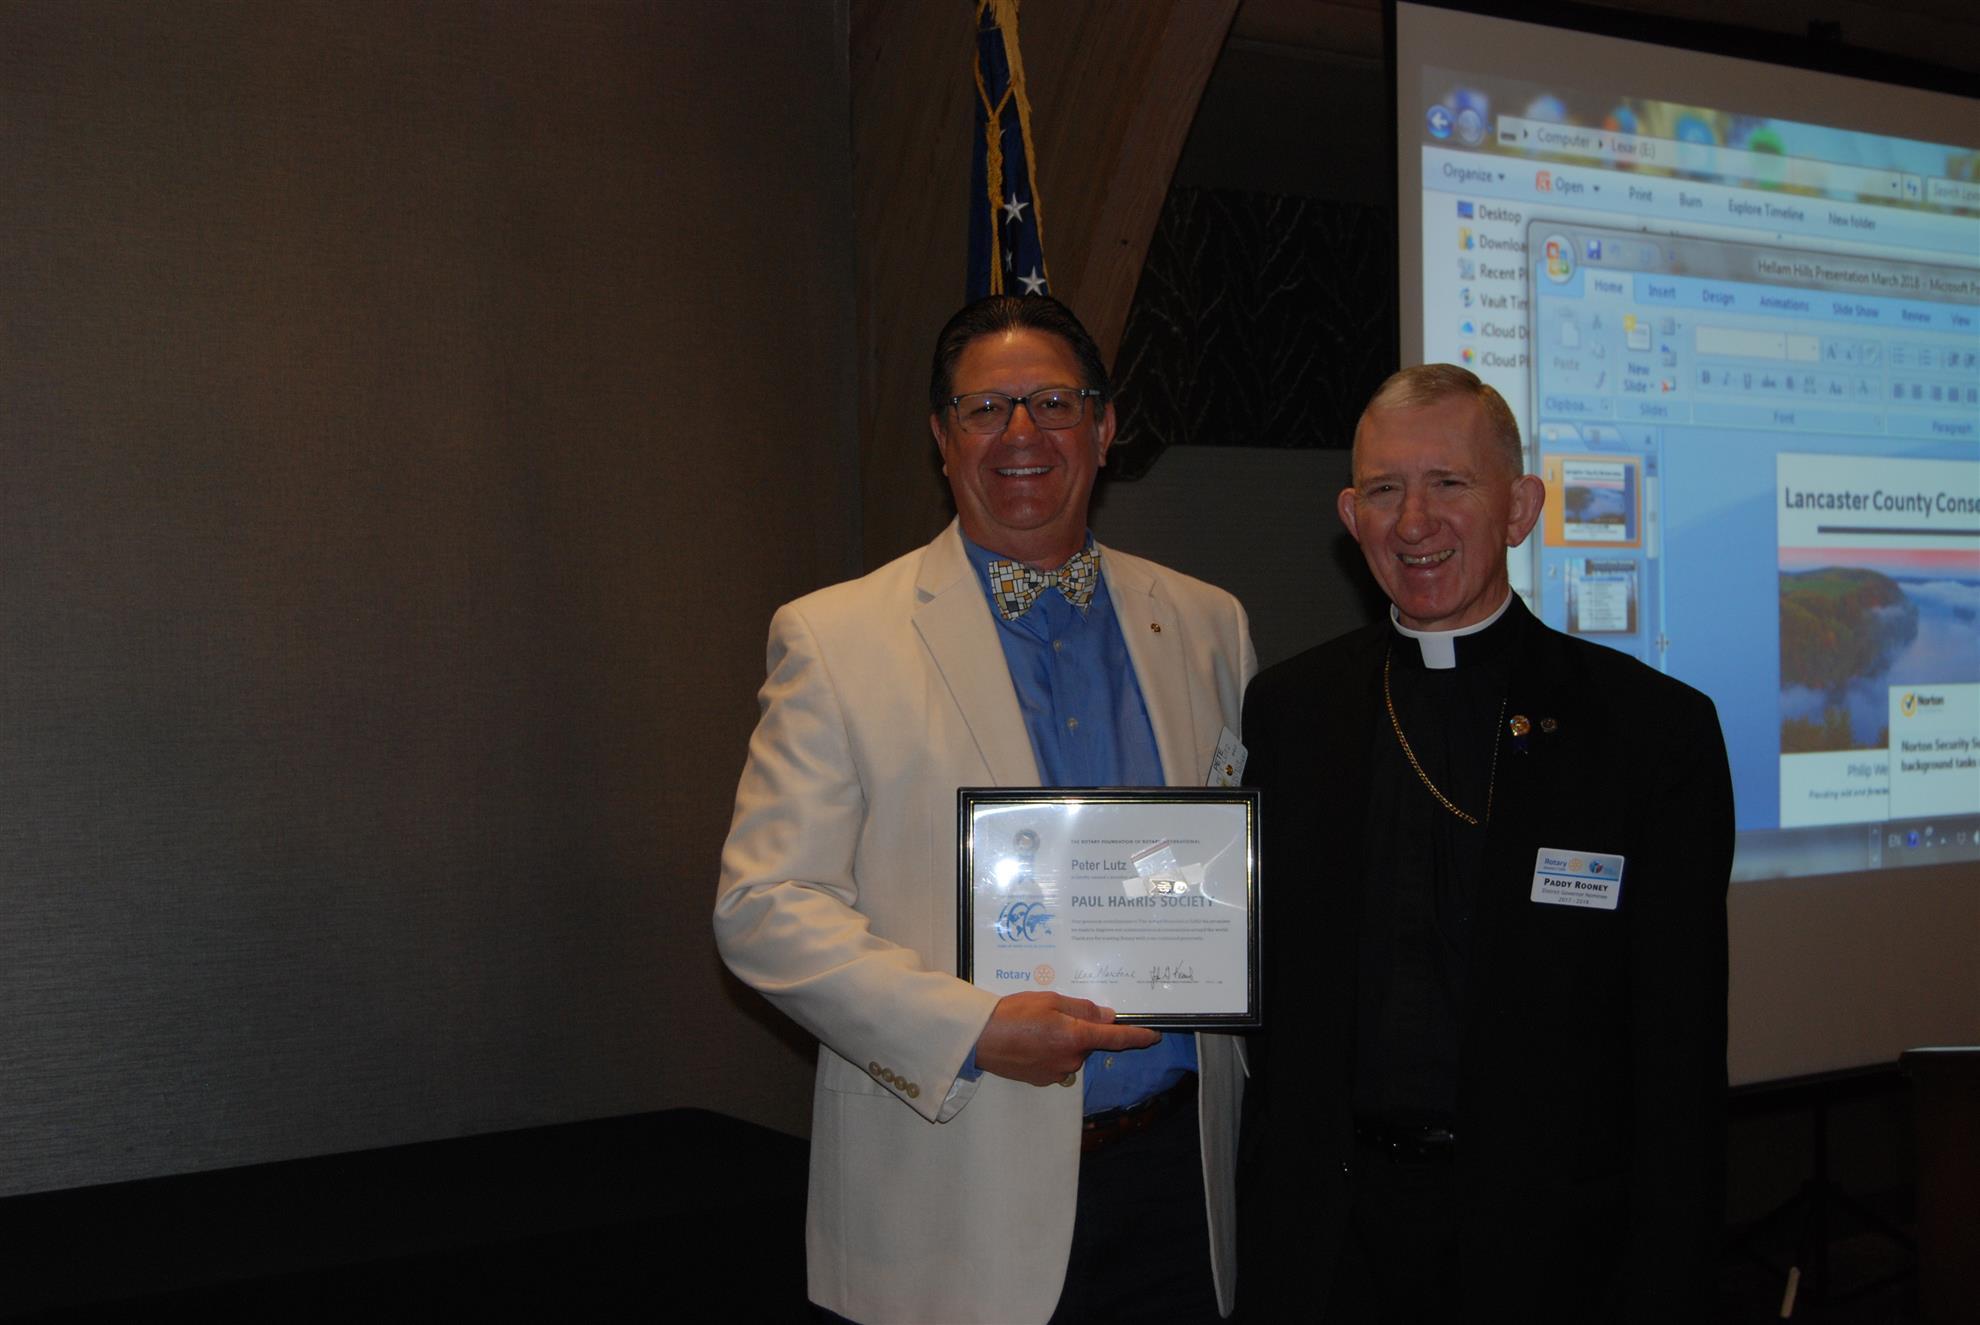 Paul Harris Society Award and Lancaster County Conservancy